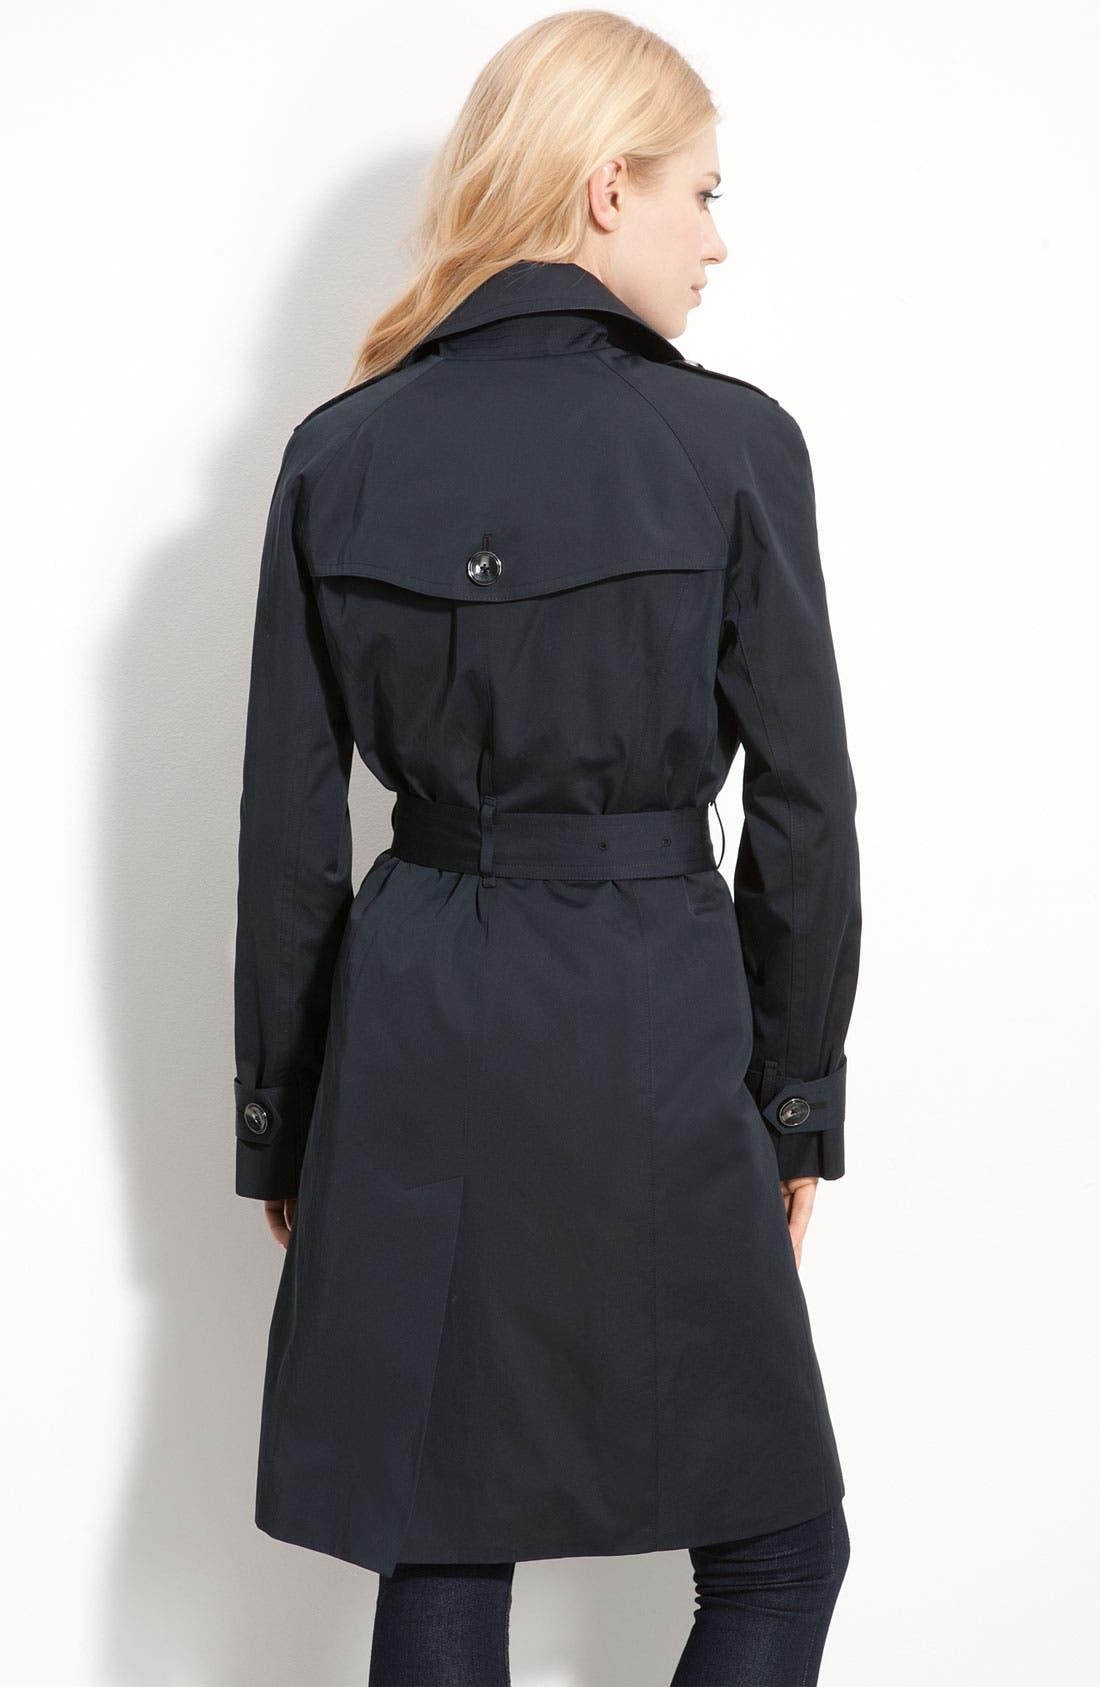 LONDON FOG, Heritage Raglan Sleeve Trench Coat with Detachable Liner, Alternate thumbnail 2, color, 001